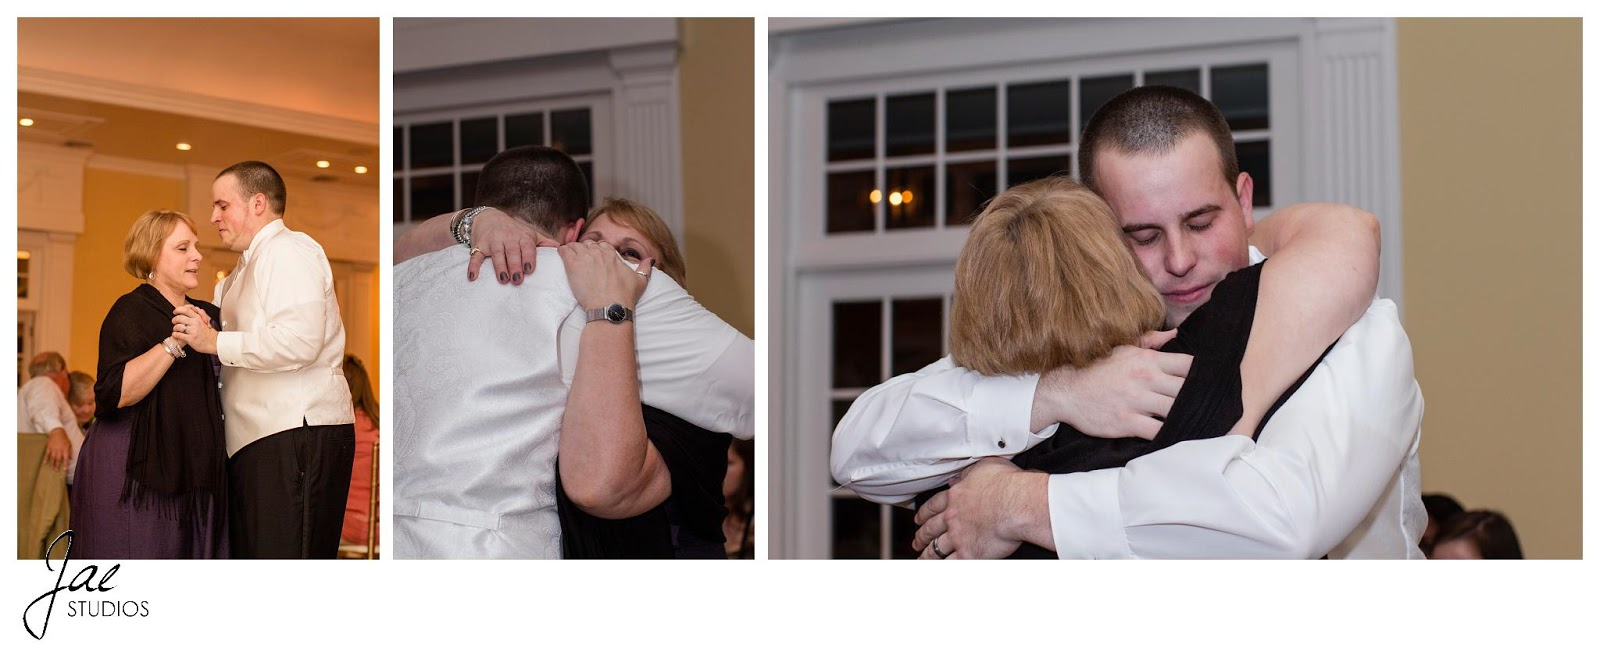 Jonathan and Julie, Bird cage, West Manor Estate, Wedding, Lynchburg, Virginia, Jae Studios, mother, groom, dancing, hugging, reception